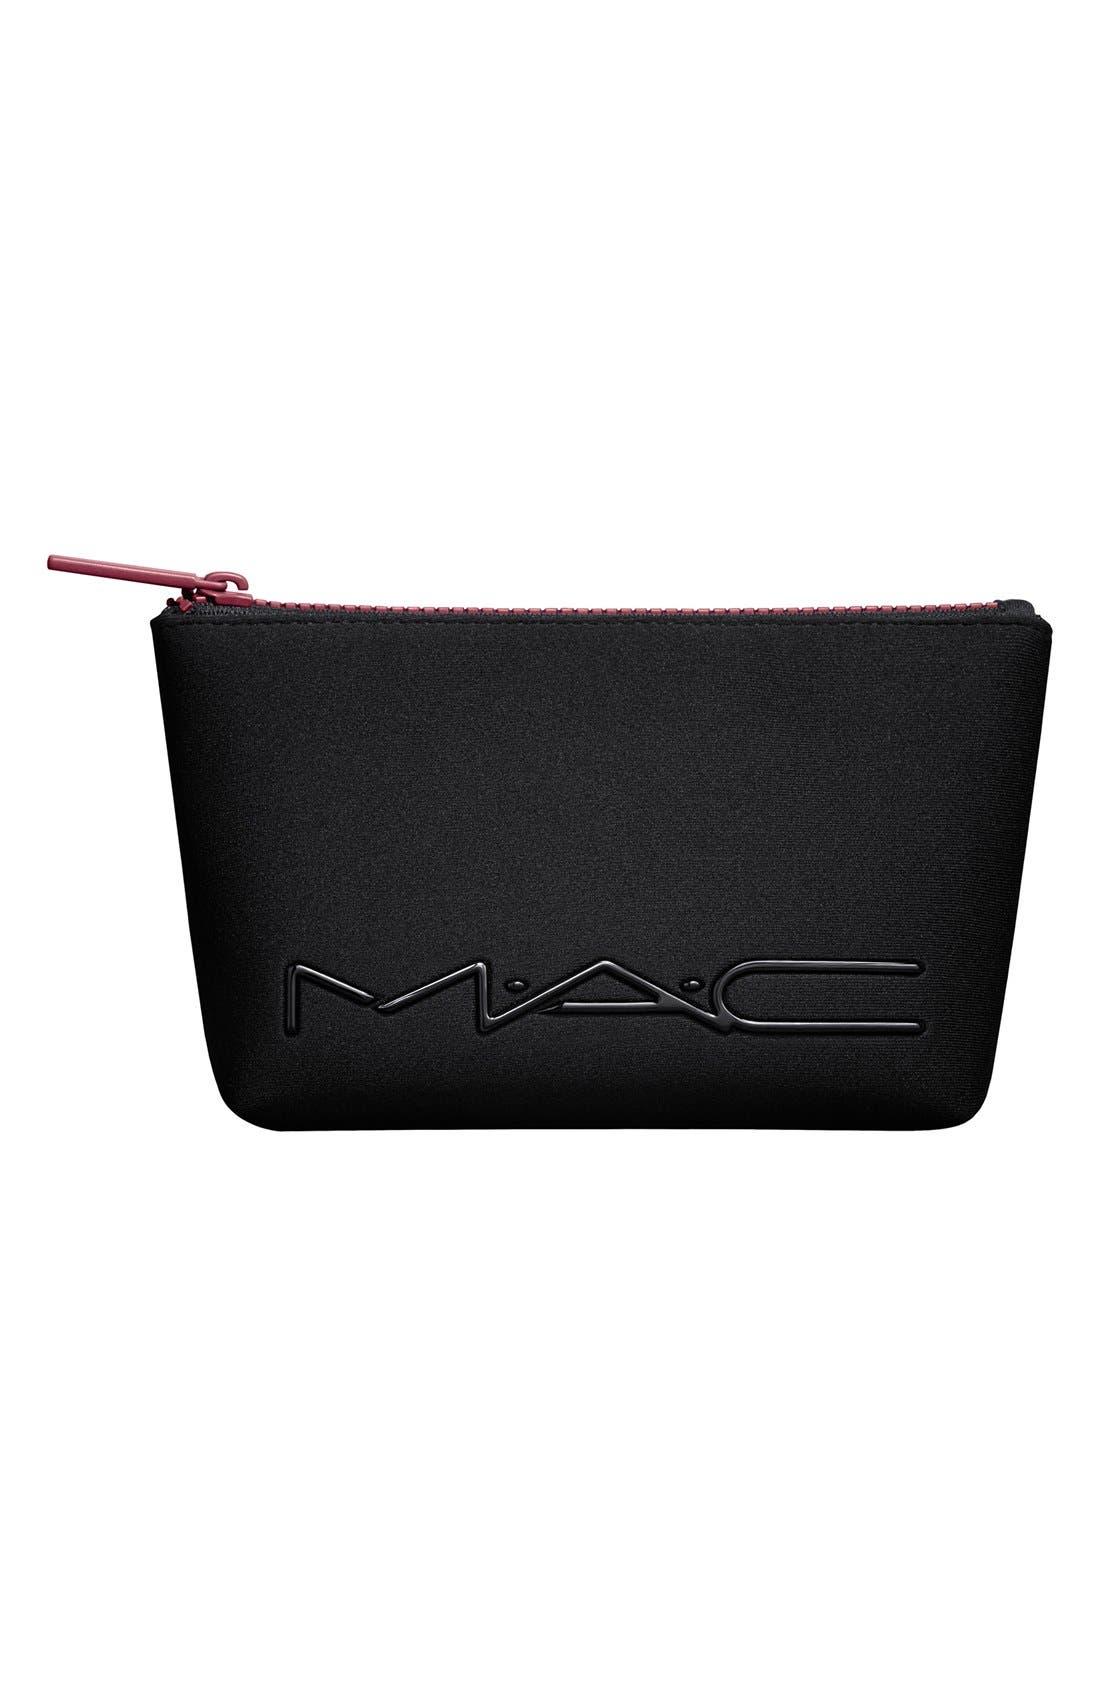 MAC 'Look in a Box - Sassy Siren' Burgundy Lip & Eye Kit,                             Alternate thumbnail 4, color,                             000